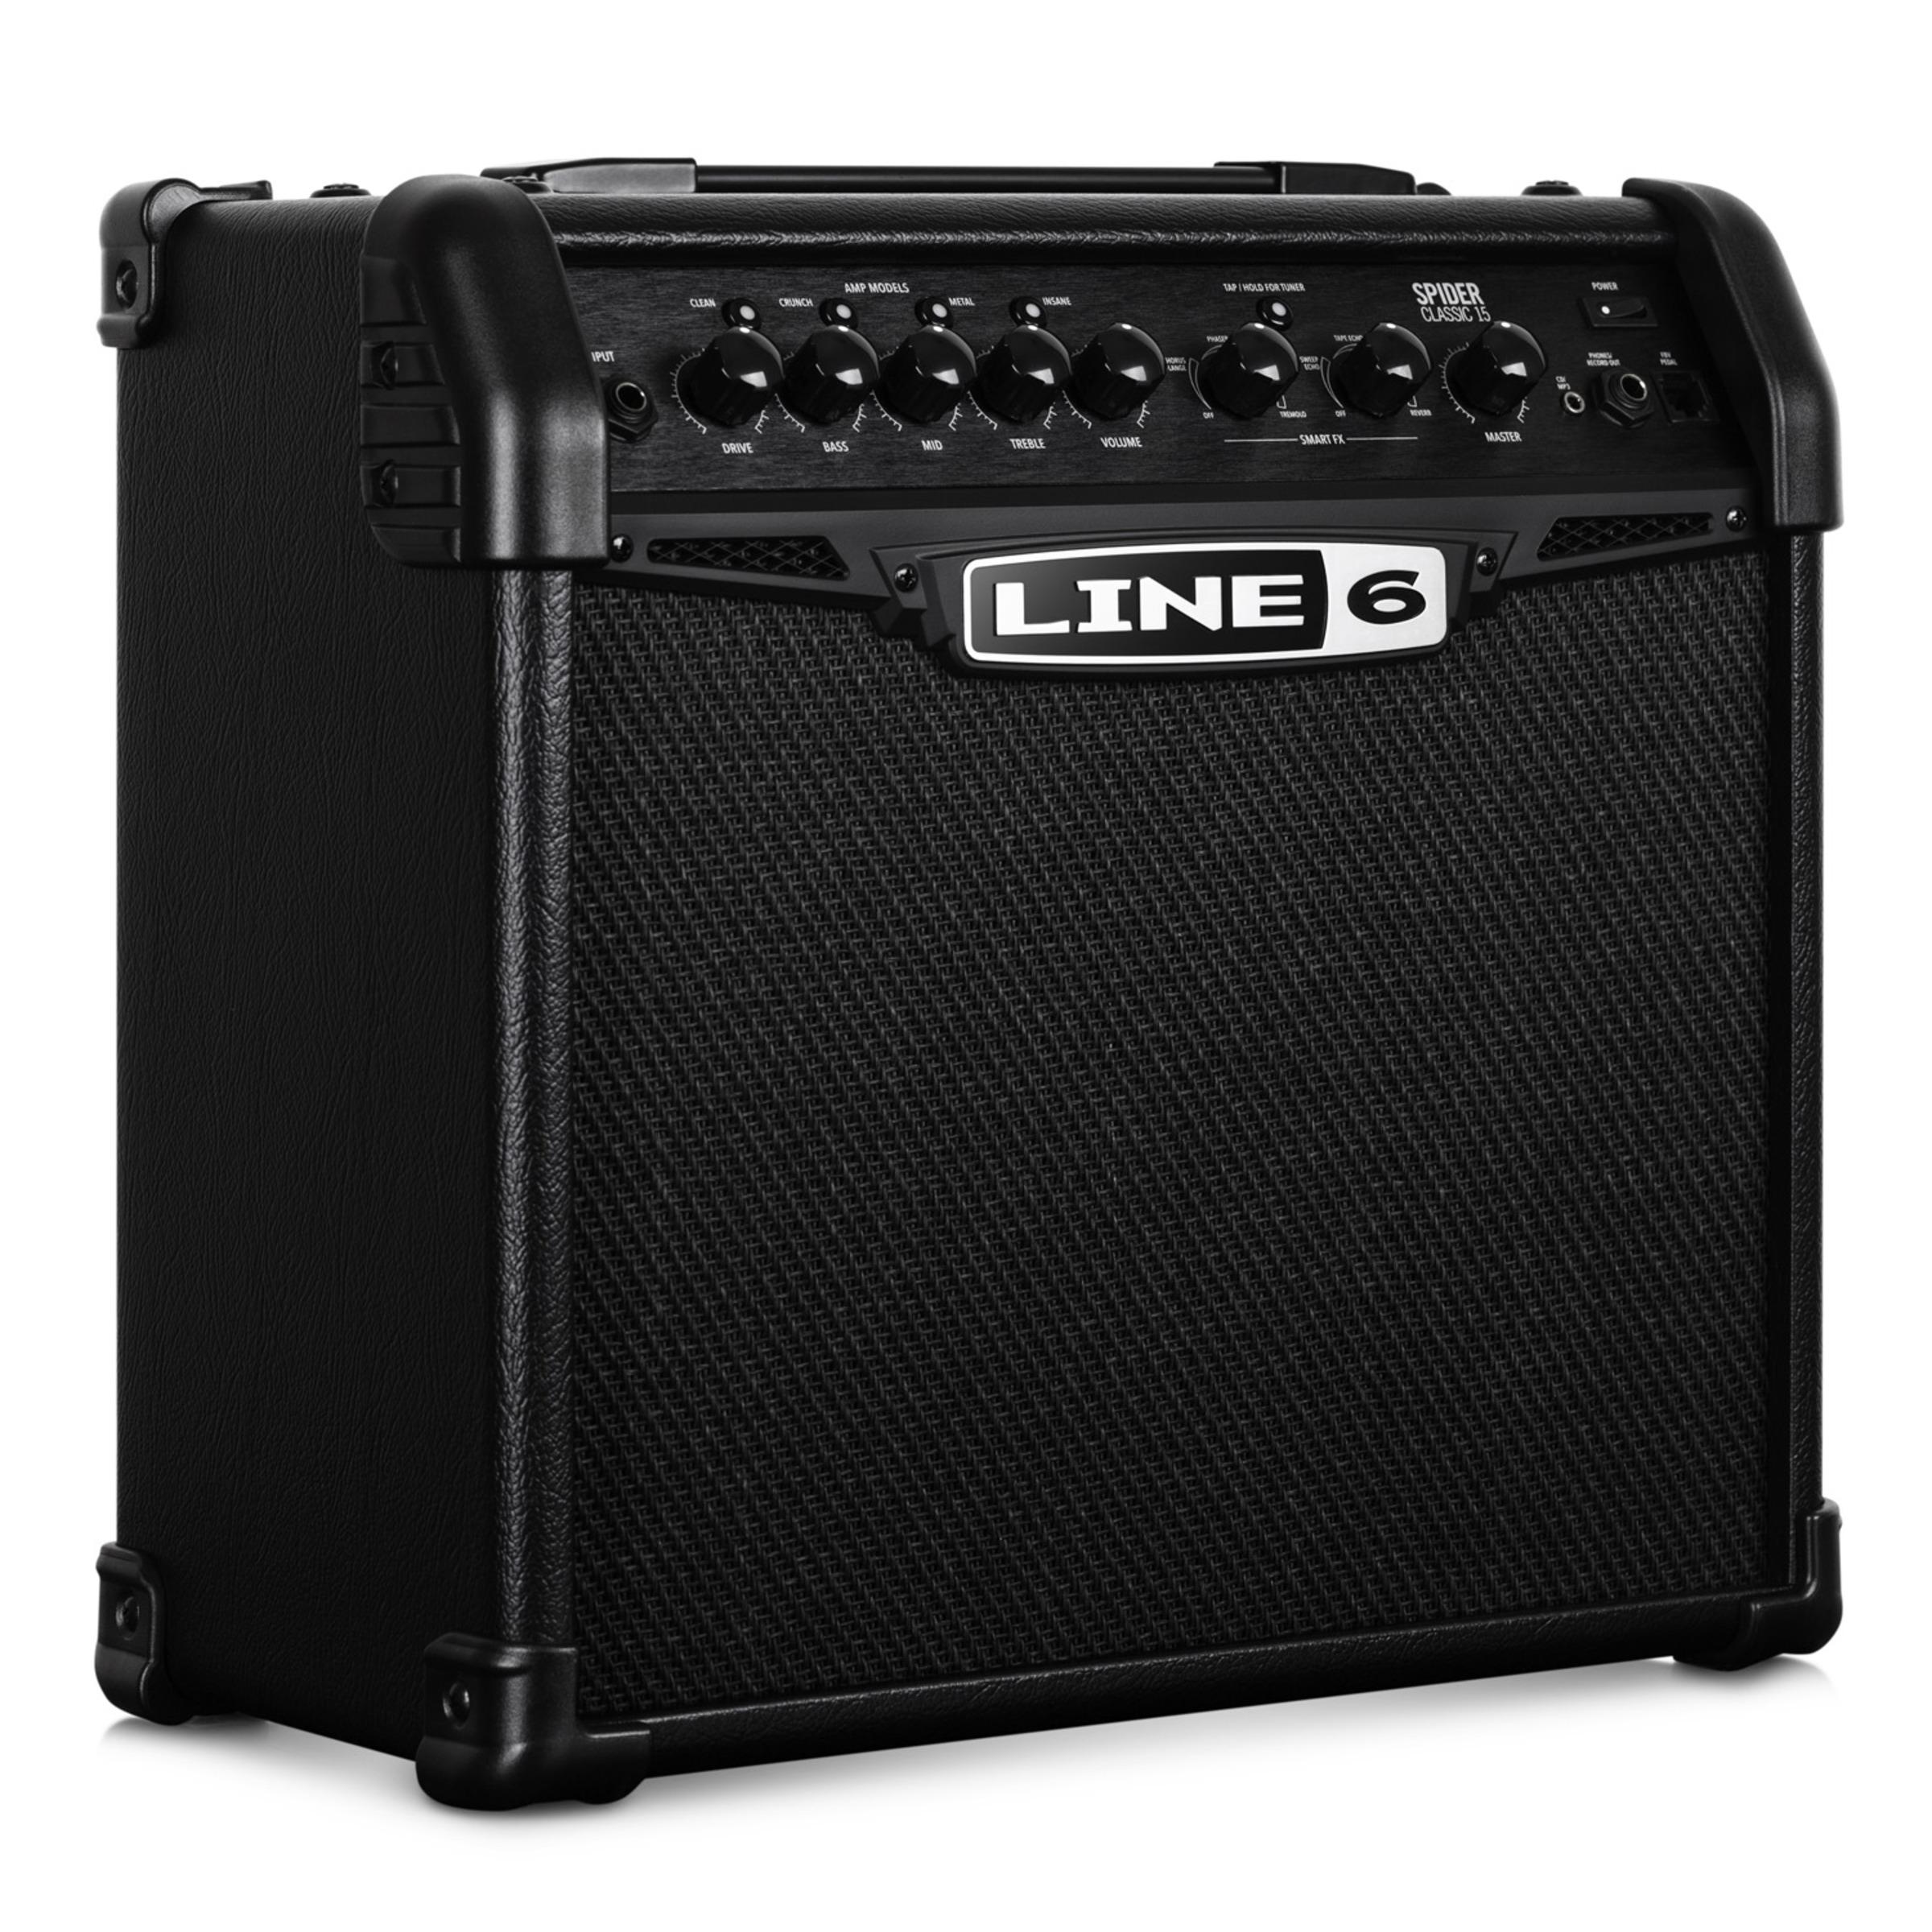 line 6 spider classic 15 15w guitar amp giggear. Black Bedroom Furniture Sets. Home Design Ideas